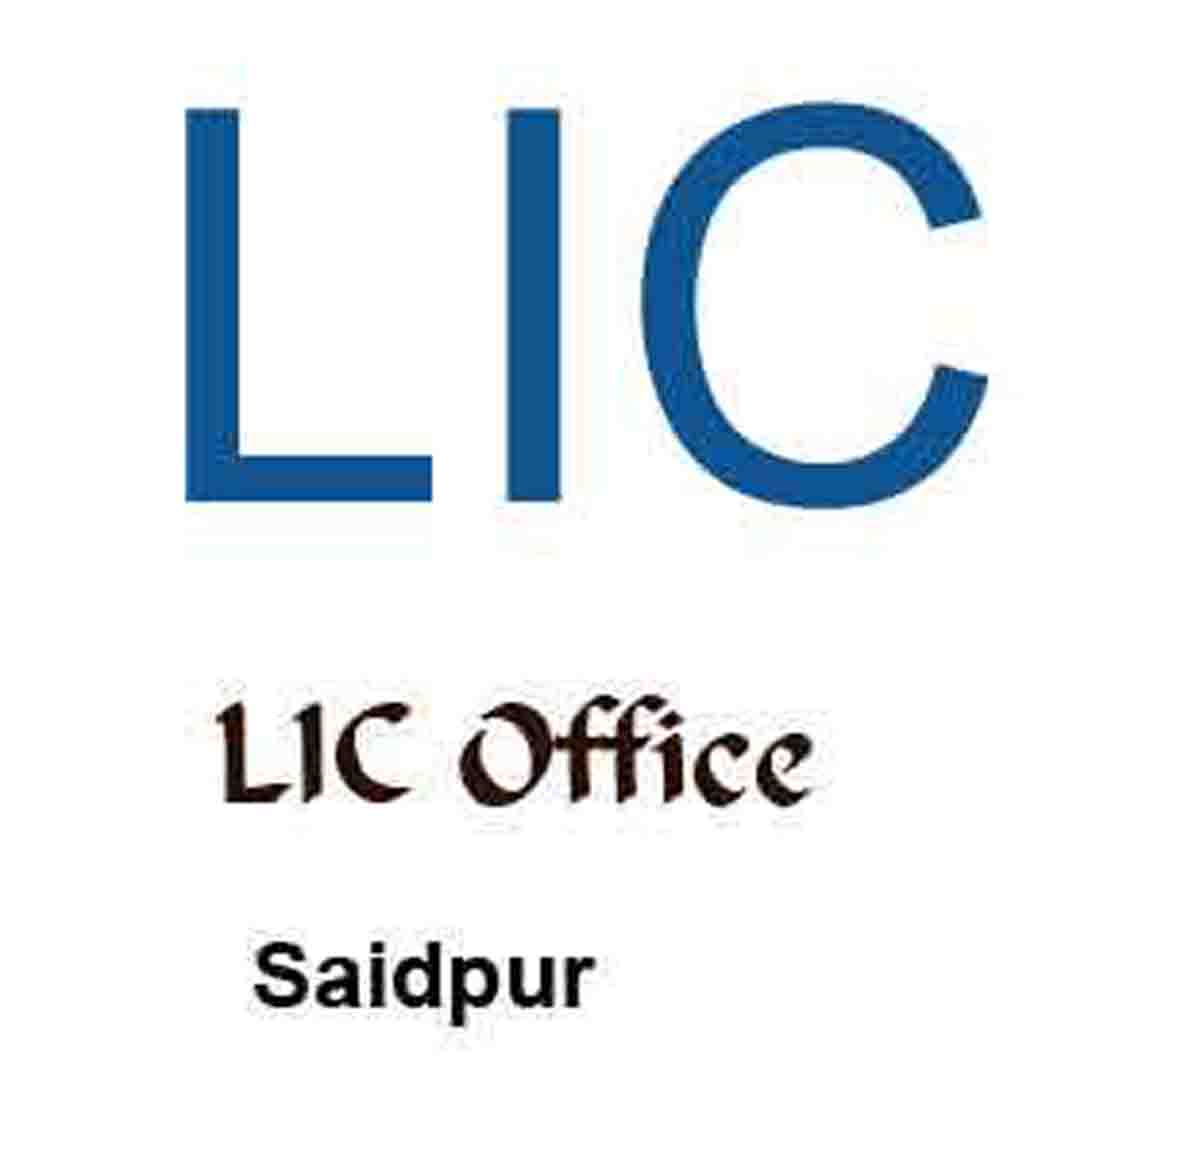 lic office saidpur